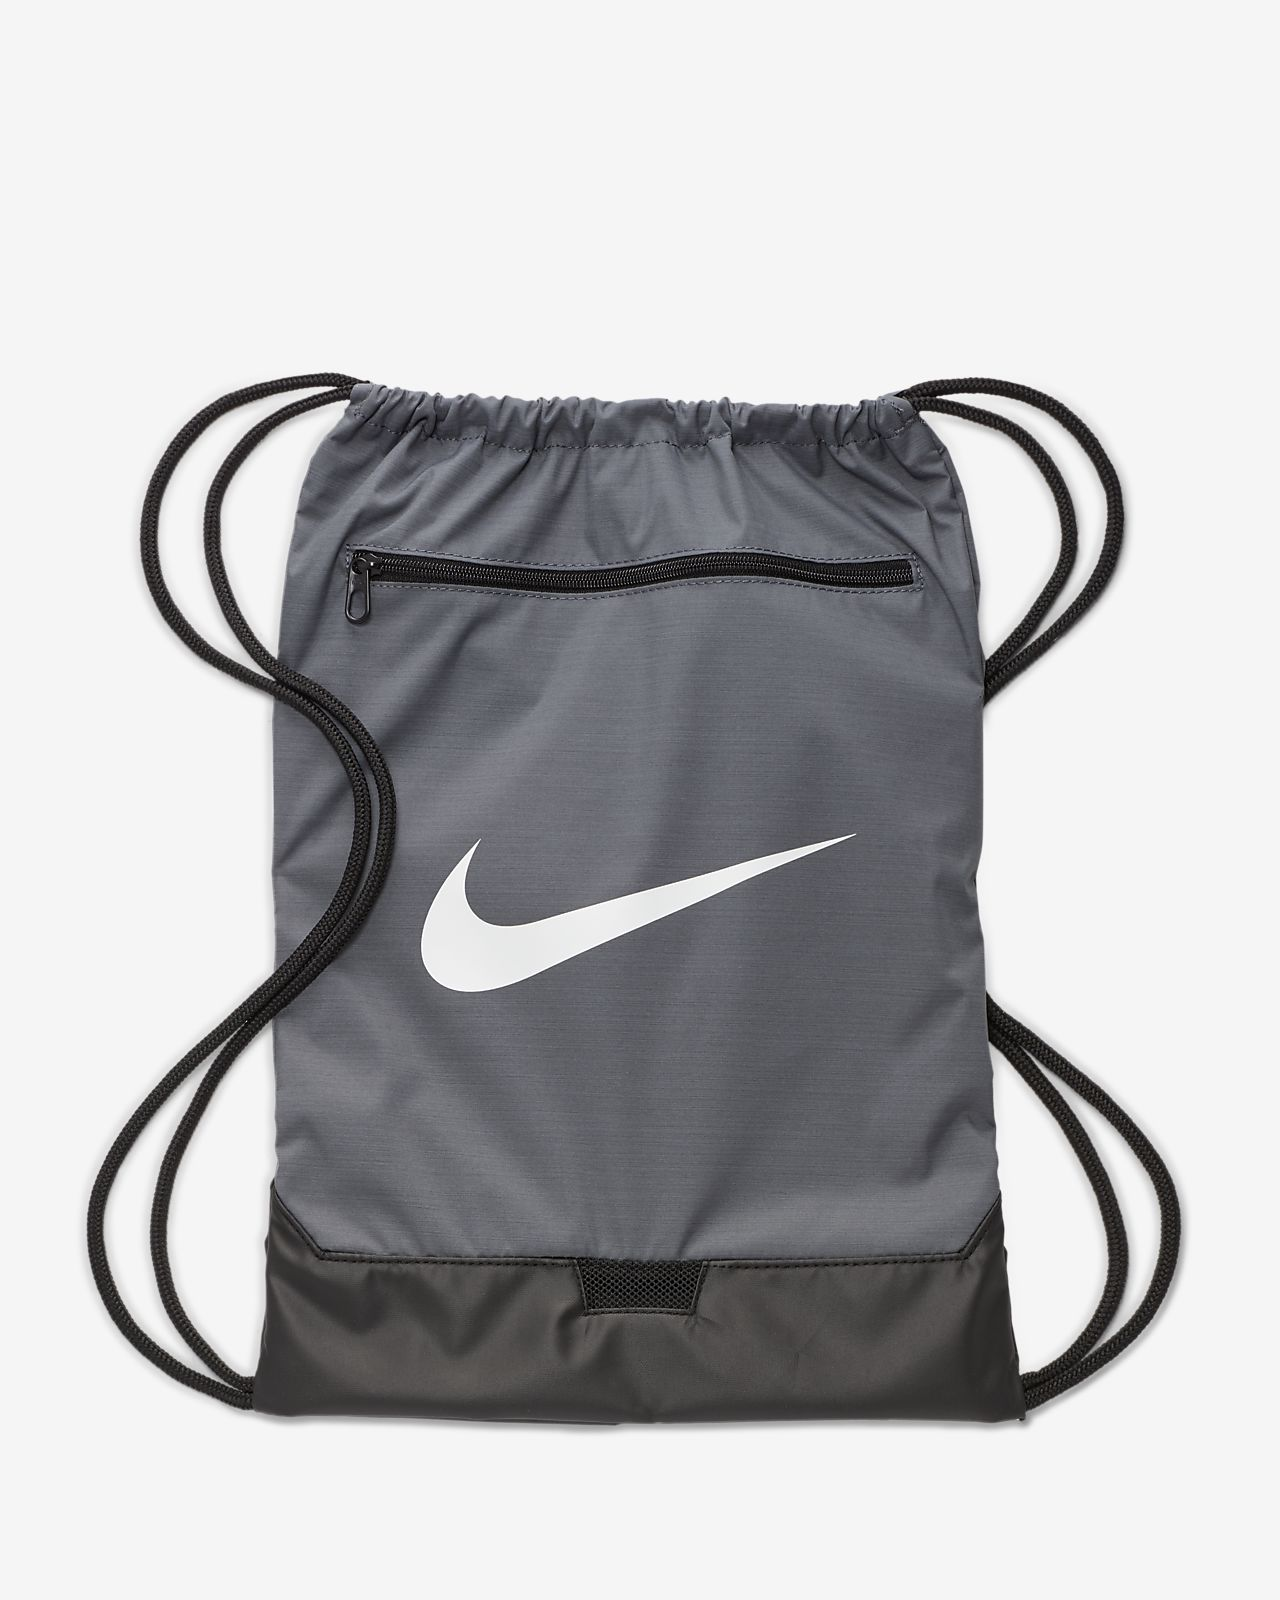 Acostumbrados a Imaginación Resolver  Nike Brasilia Training Gymsack. Nike MA